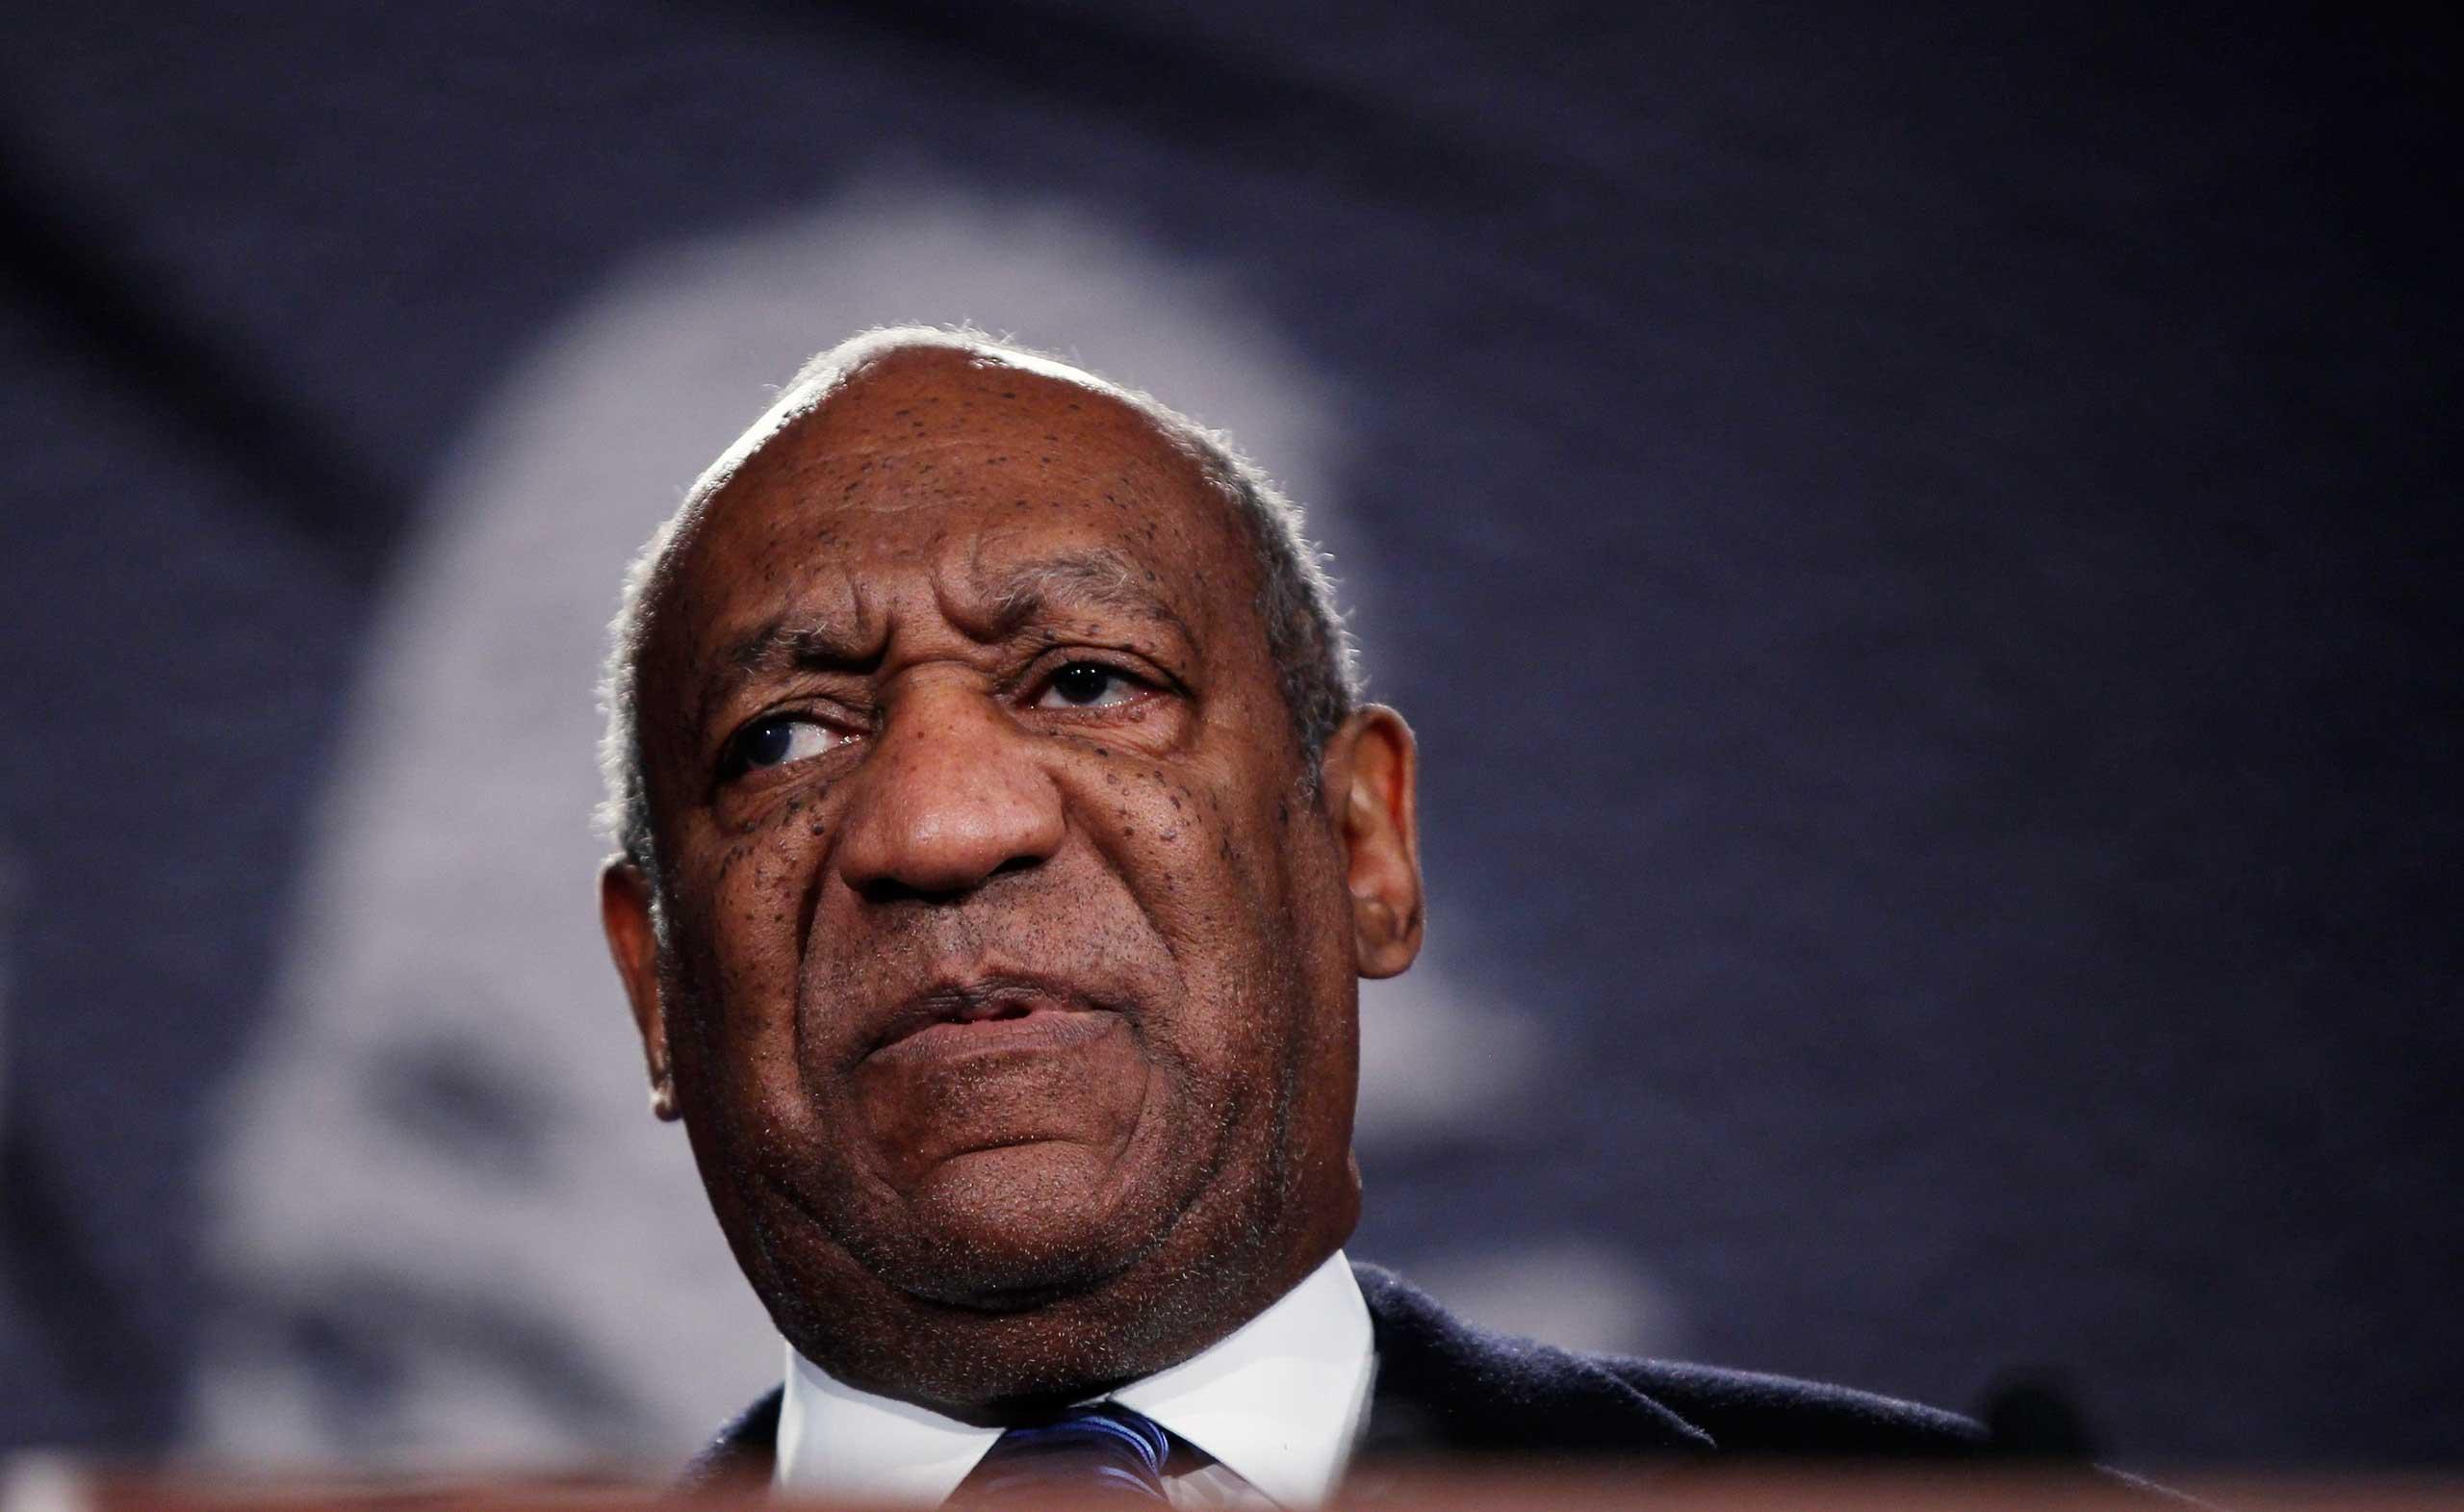 Bill Cosby in New York in 2011.